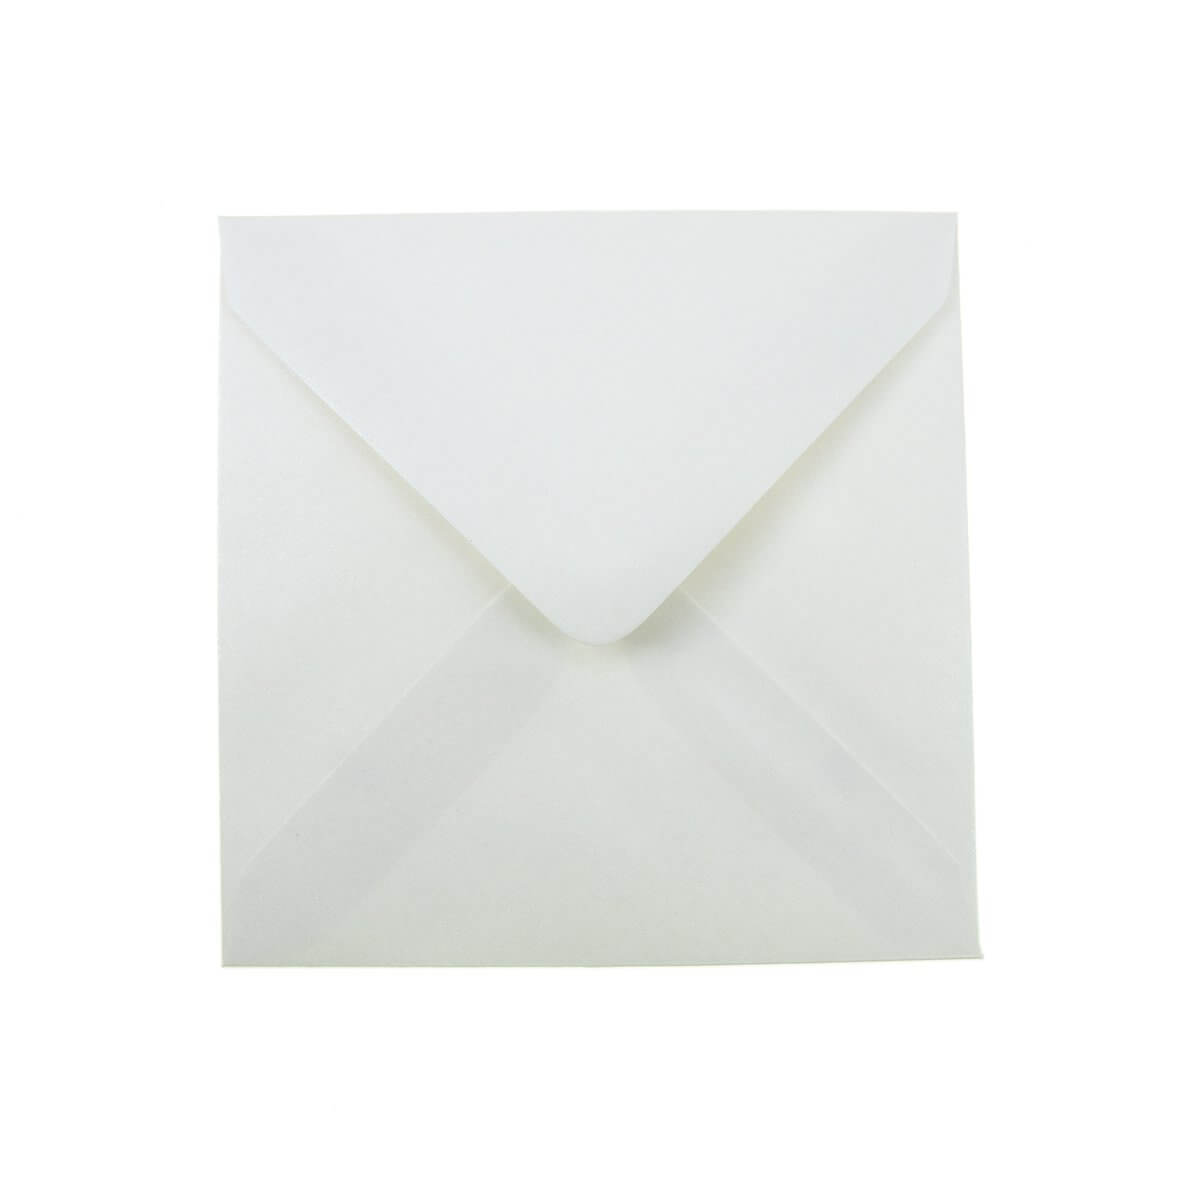 Fabrique Dandy White Small Square 130mm Envelope